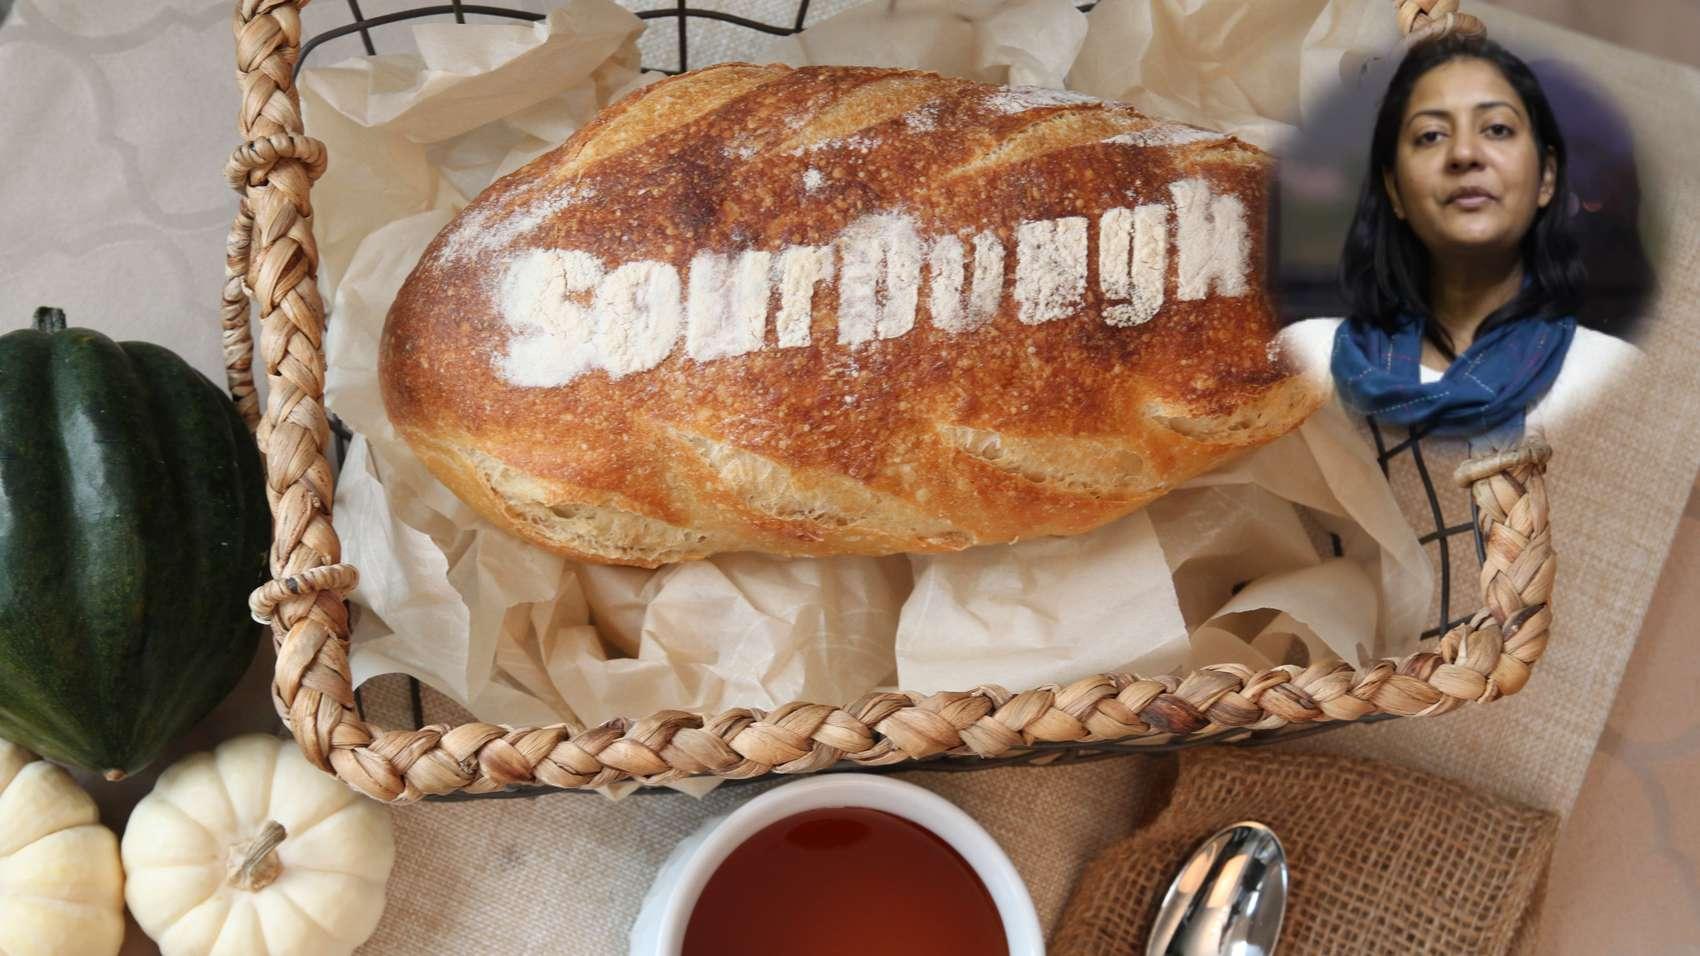 Career in Sourdough Baking